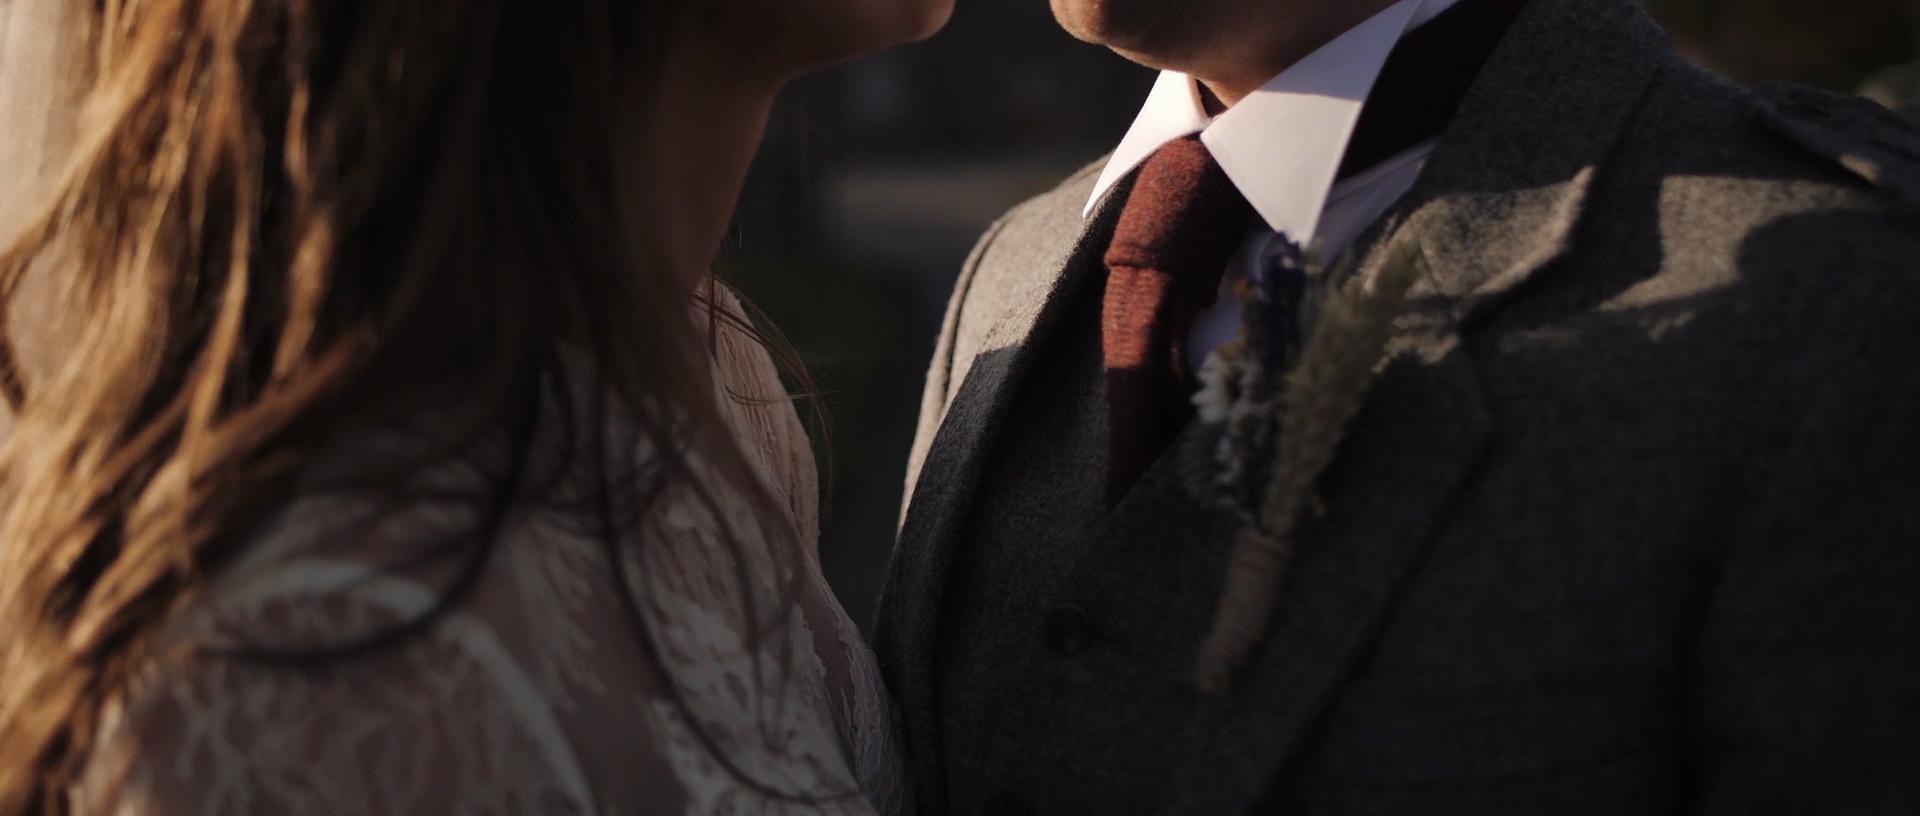 the-byre-at-inchyra-wedding-videographer_LL_04.jpg